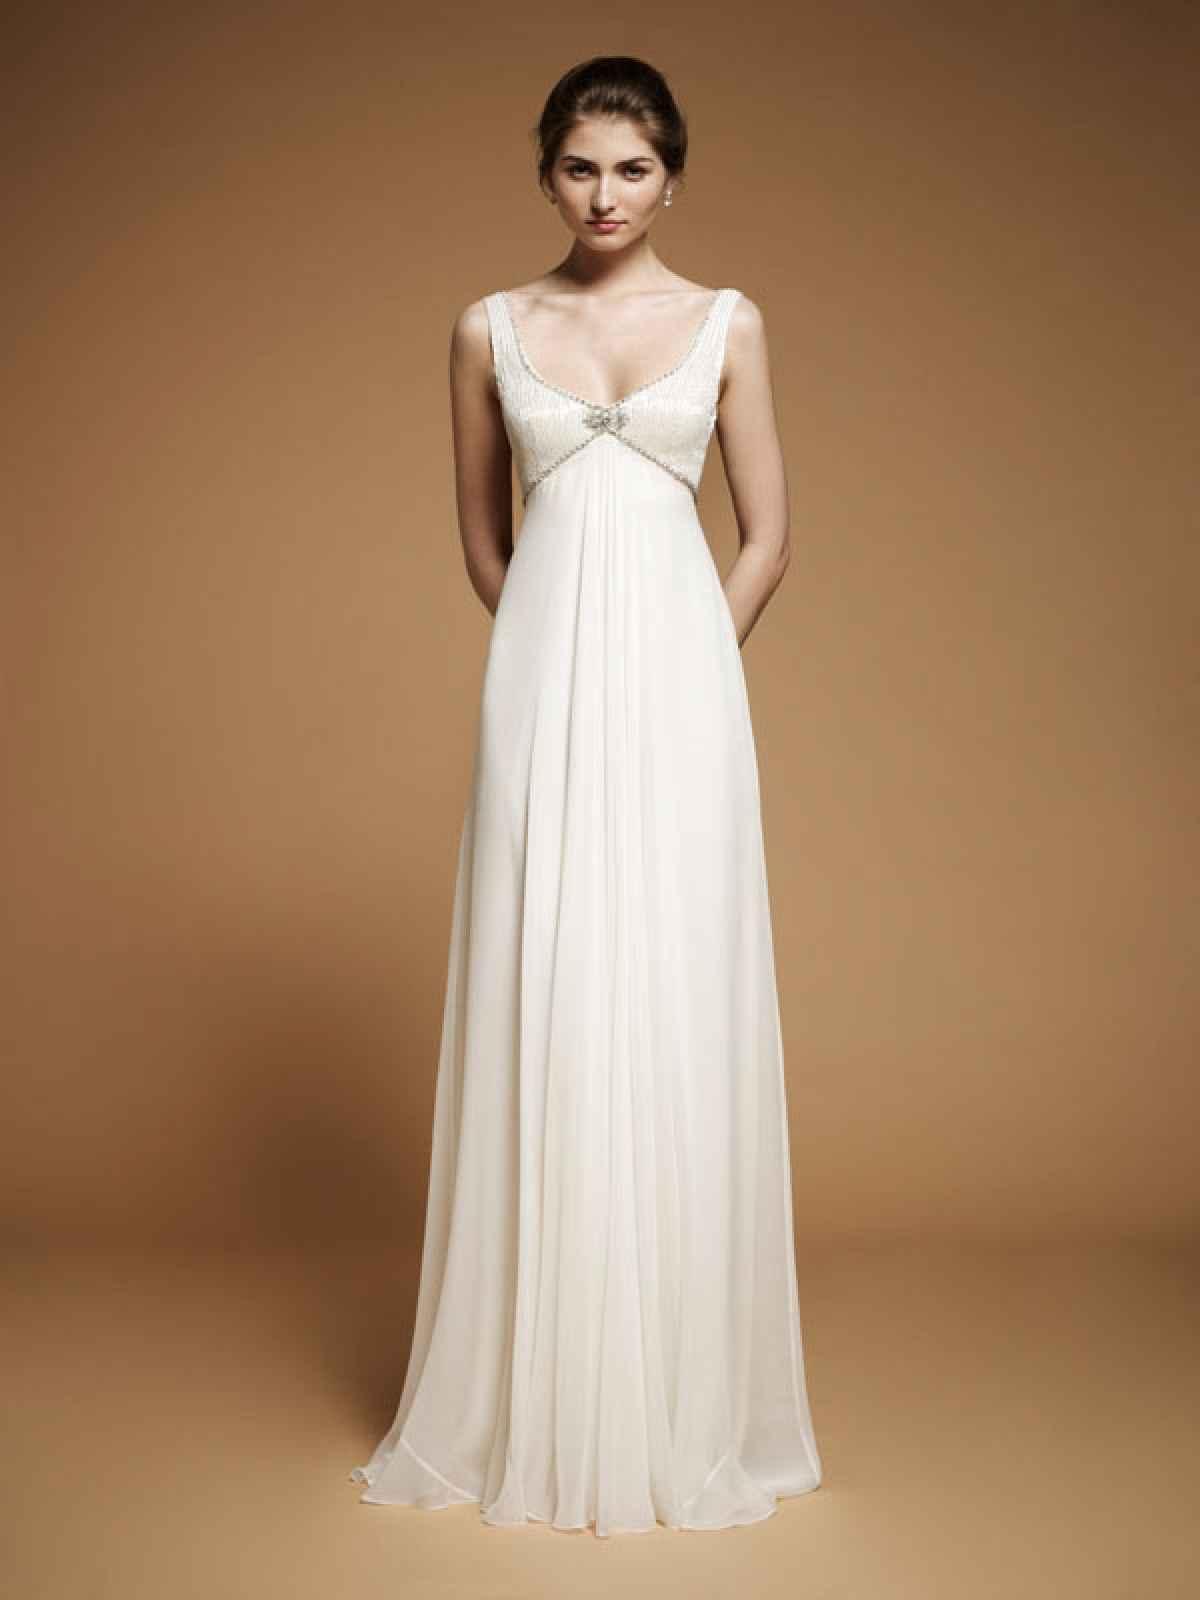 Wedding dresses for women over 40 cocktail dresses 2016 for Wedding dresses women over 40